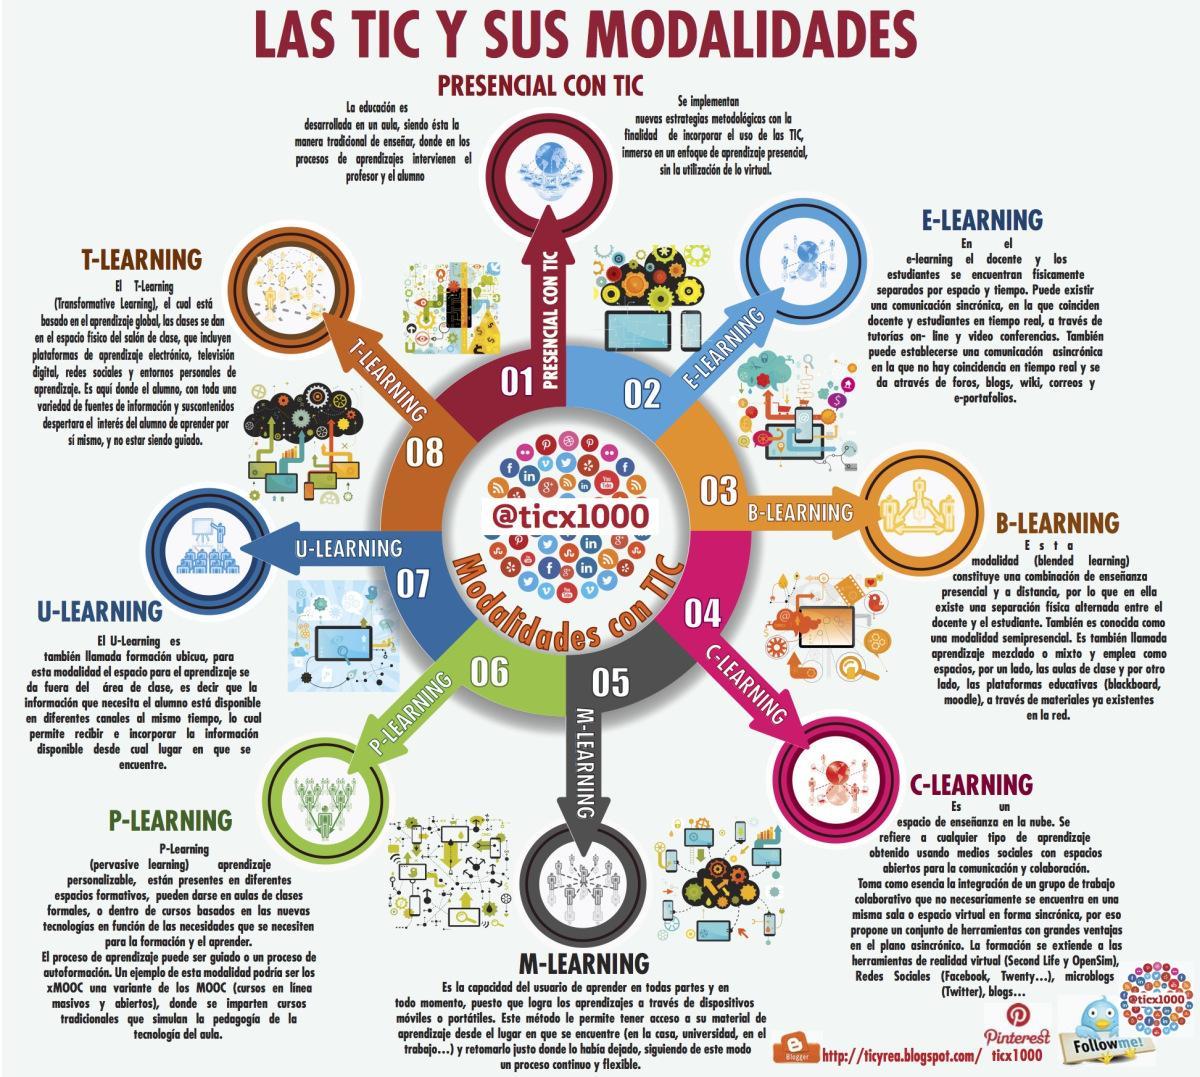 ¿E-learning, M-learning...? ¿Sabes diferenciarlos? vía @ticx1000 http://t.co/TzhEiAIqQW http://t.co/yllgipKtwB